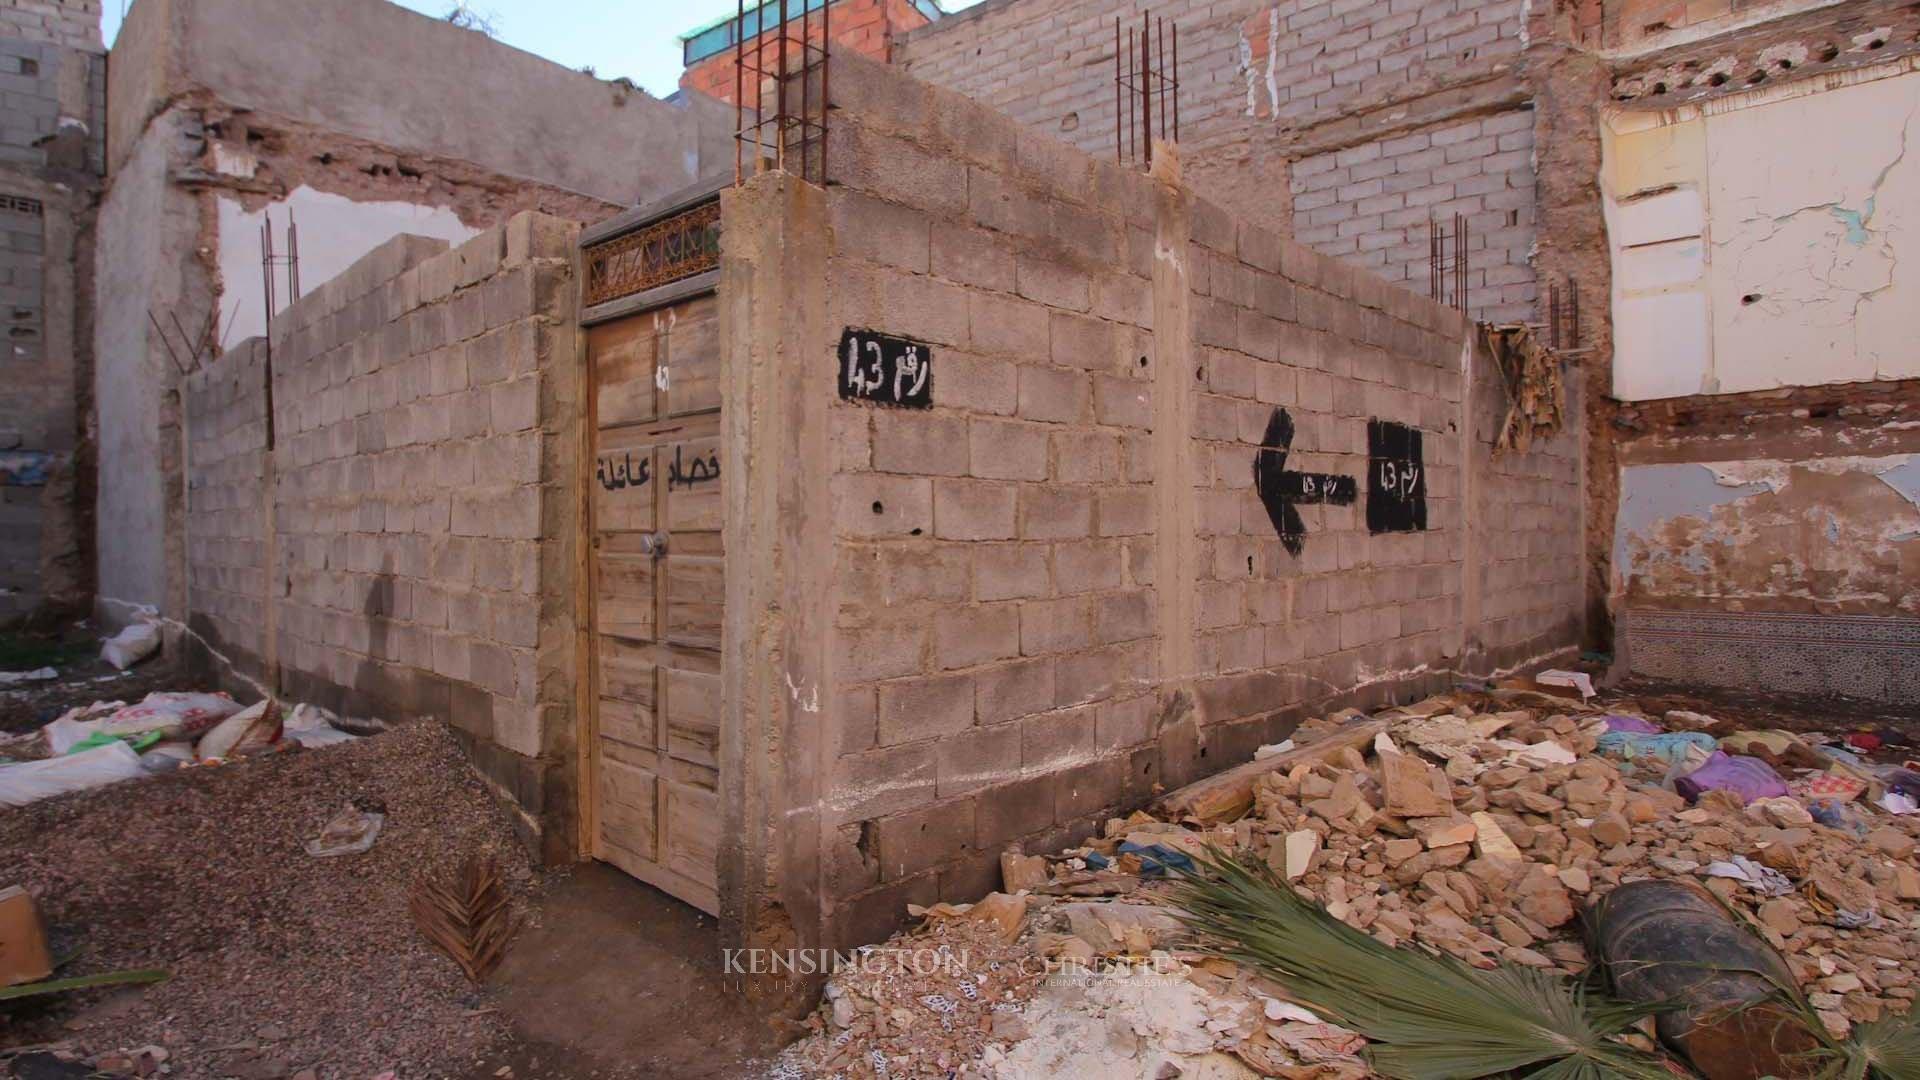 KPPM01134: Terrains Bensi Terrain constructible Marrakech Maroc